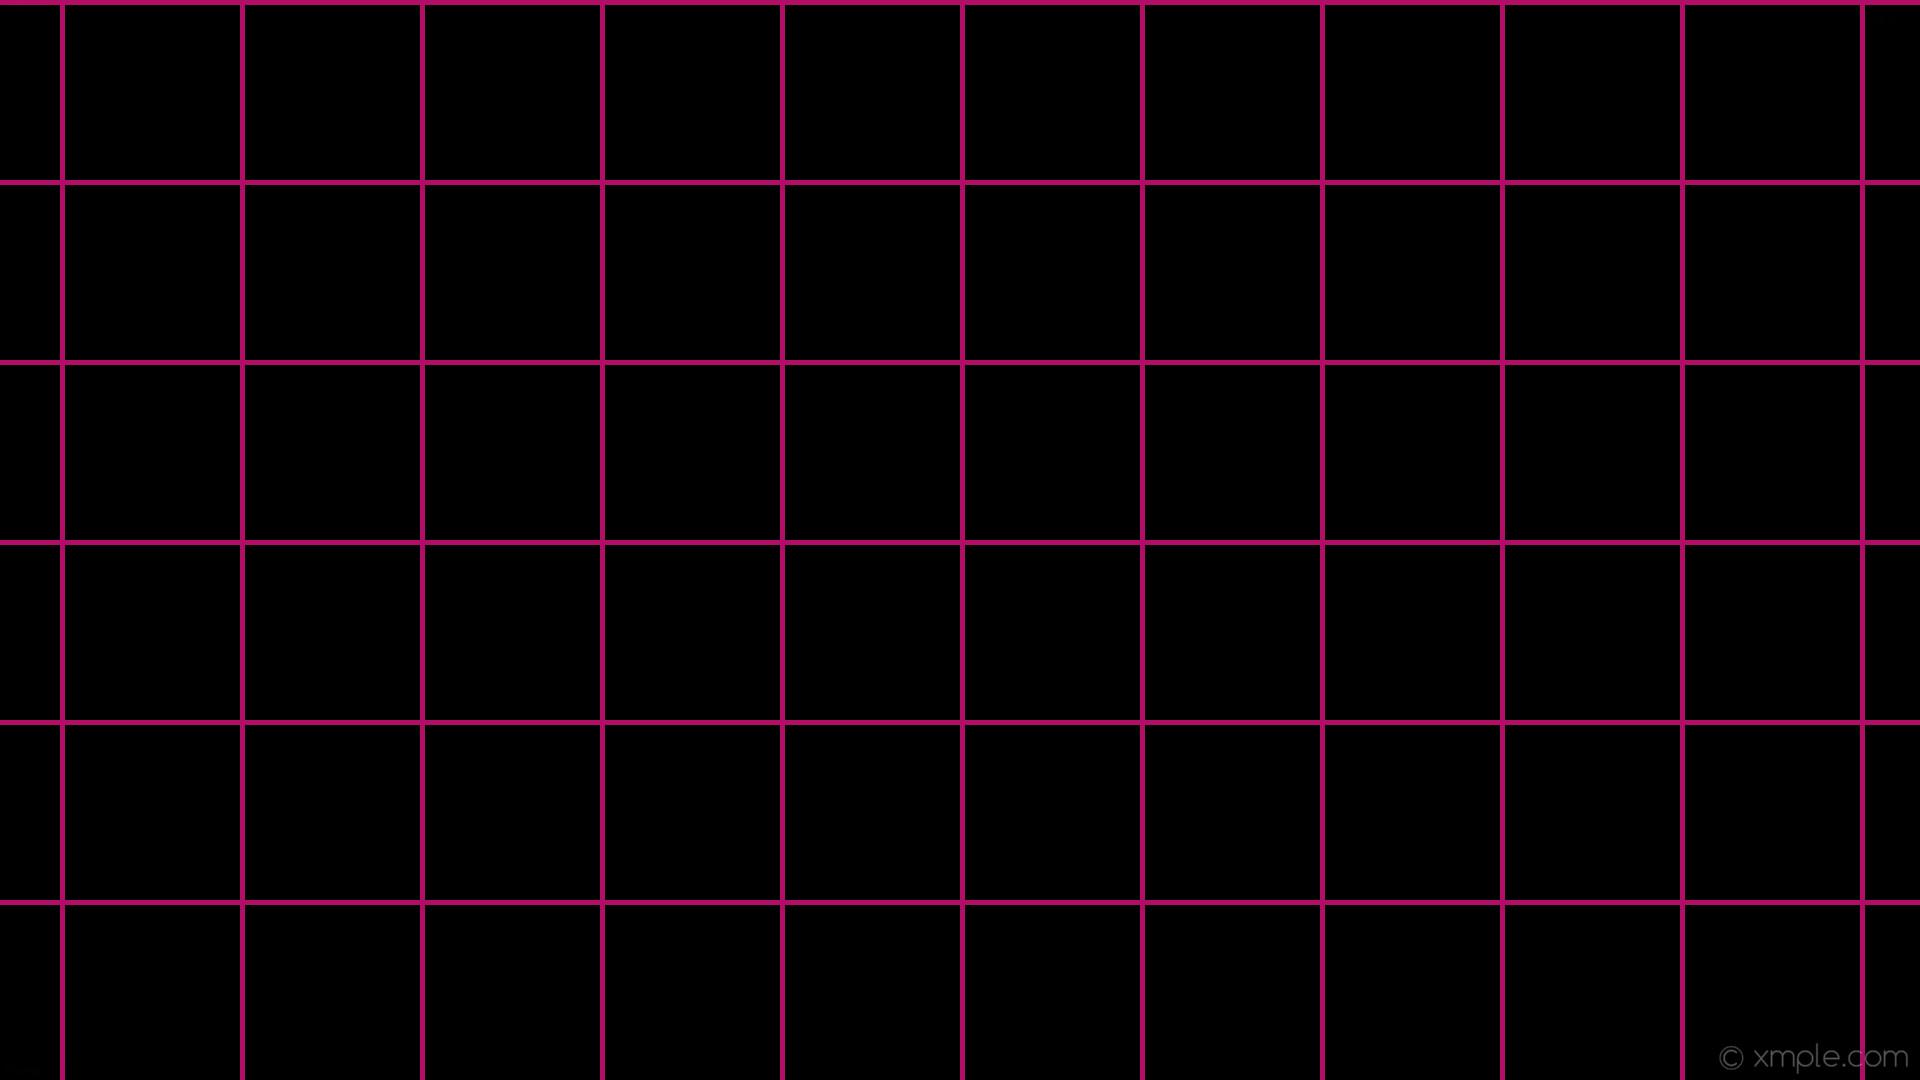 wallpaper graph paper black pink grid deep pink #000000 #ff1493 0° 5px 180px